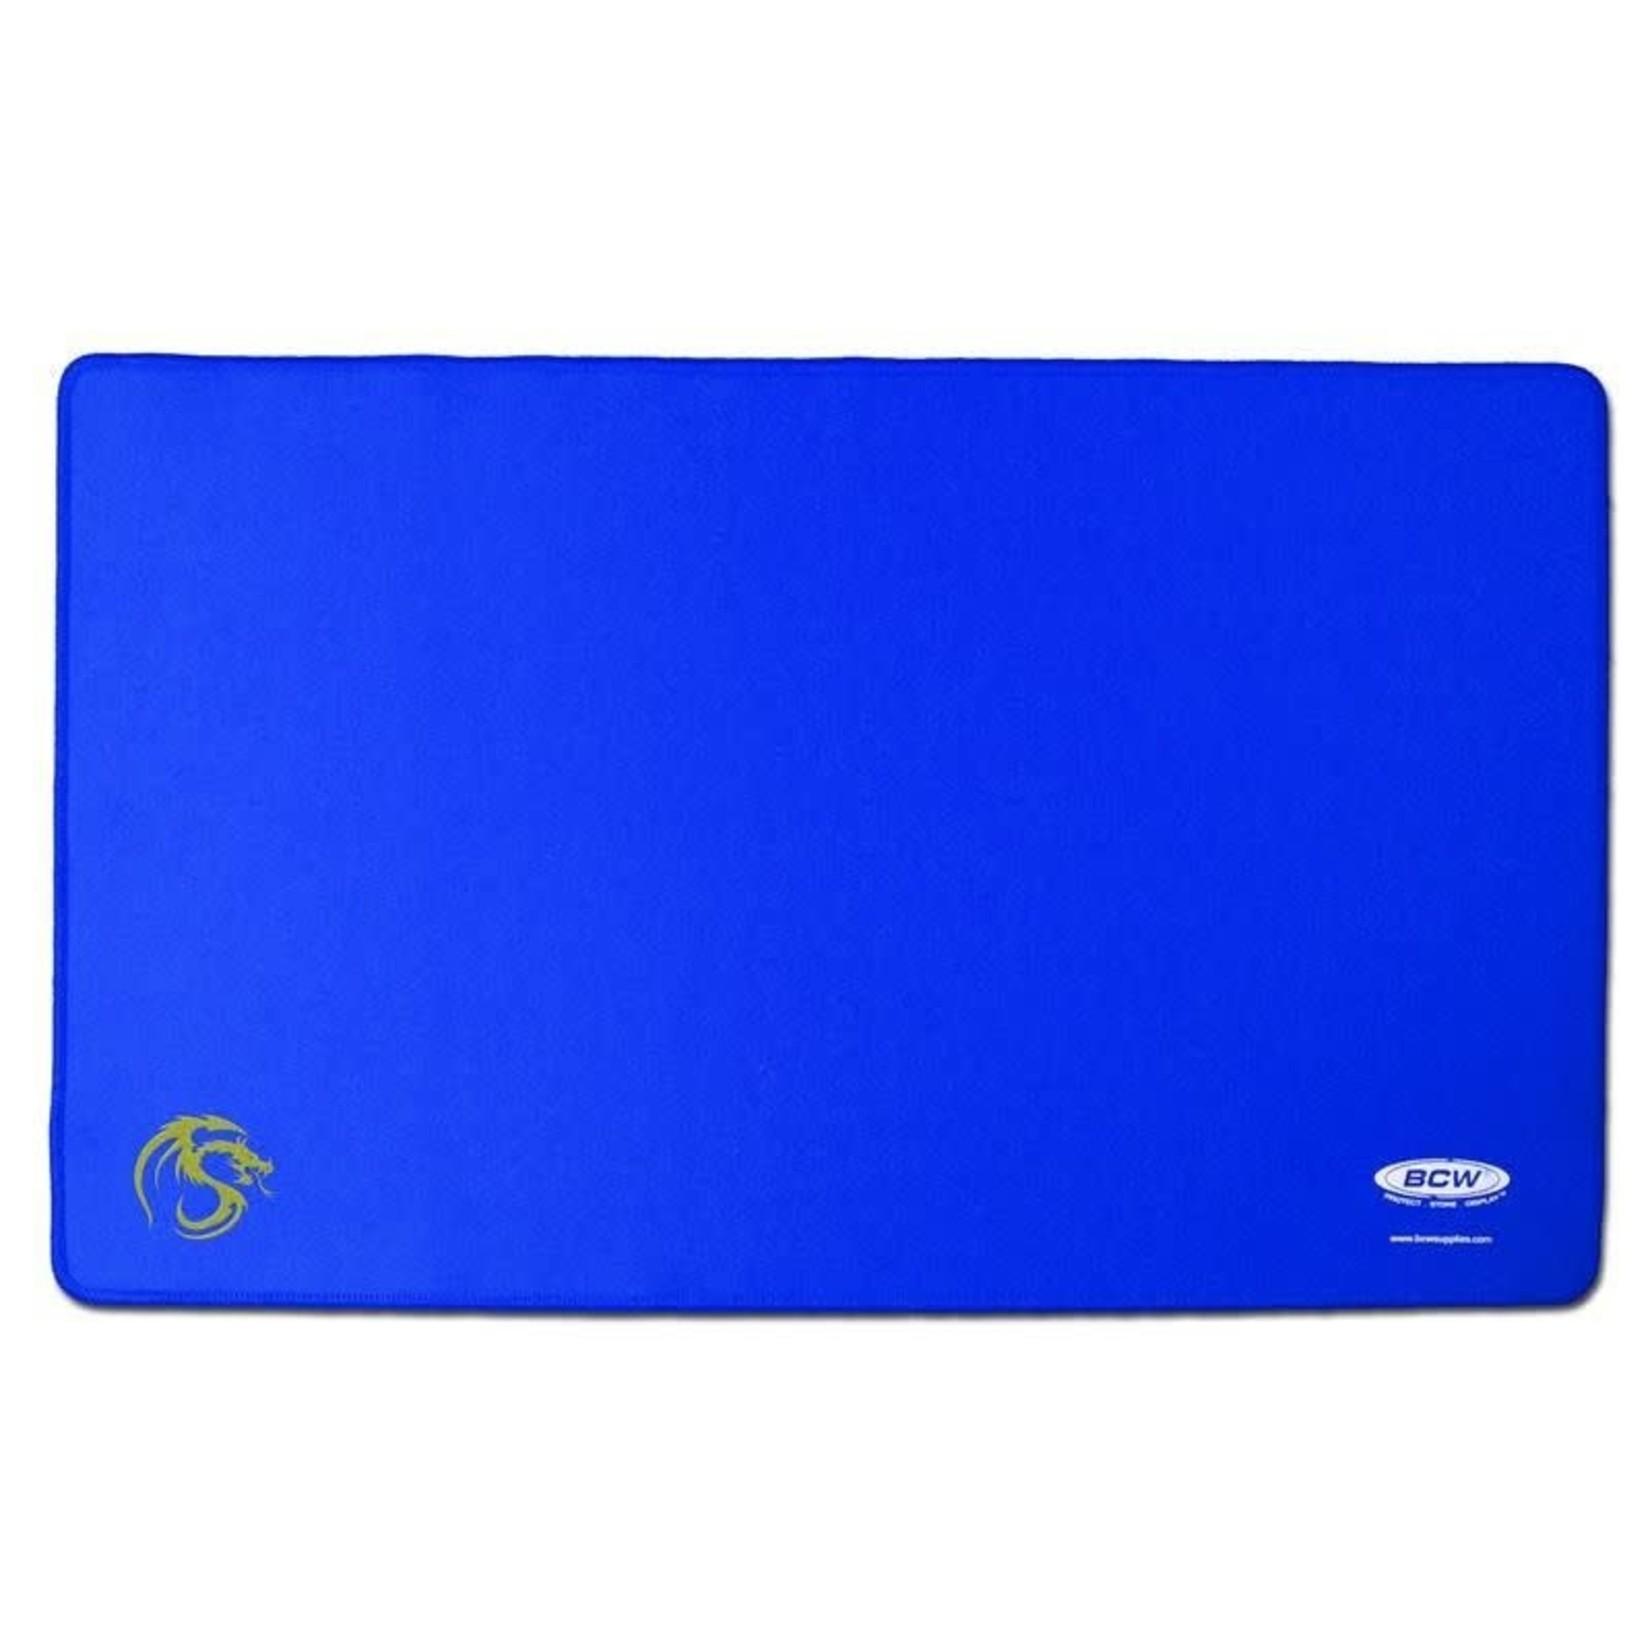 BCW Blue Playmat